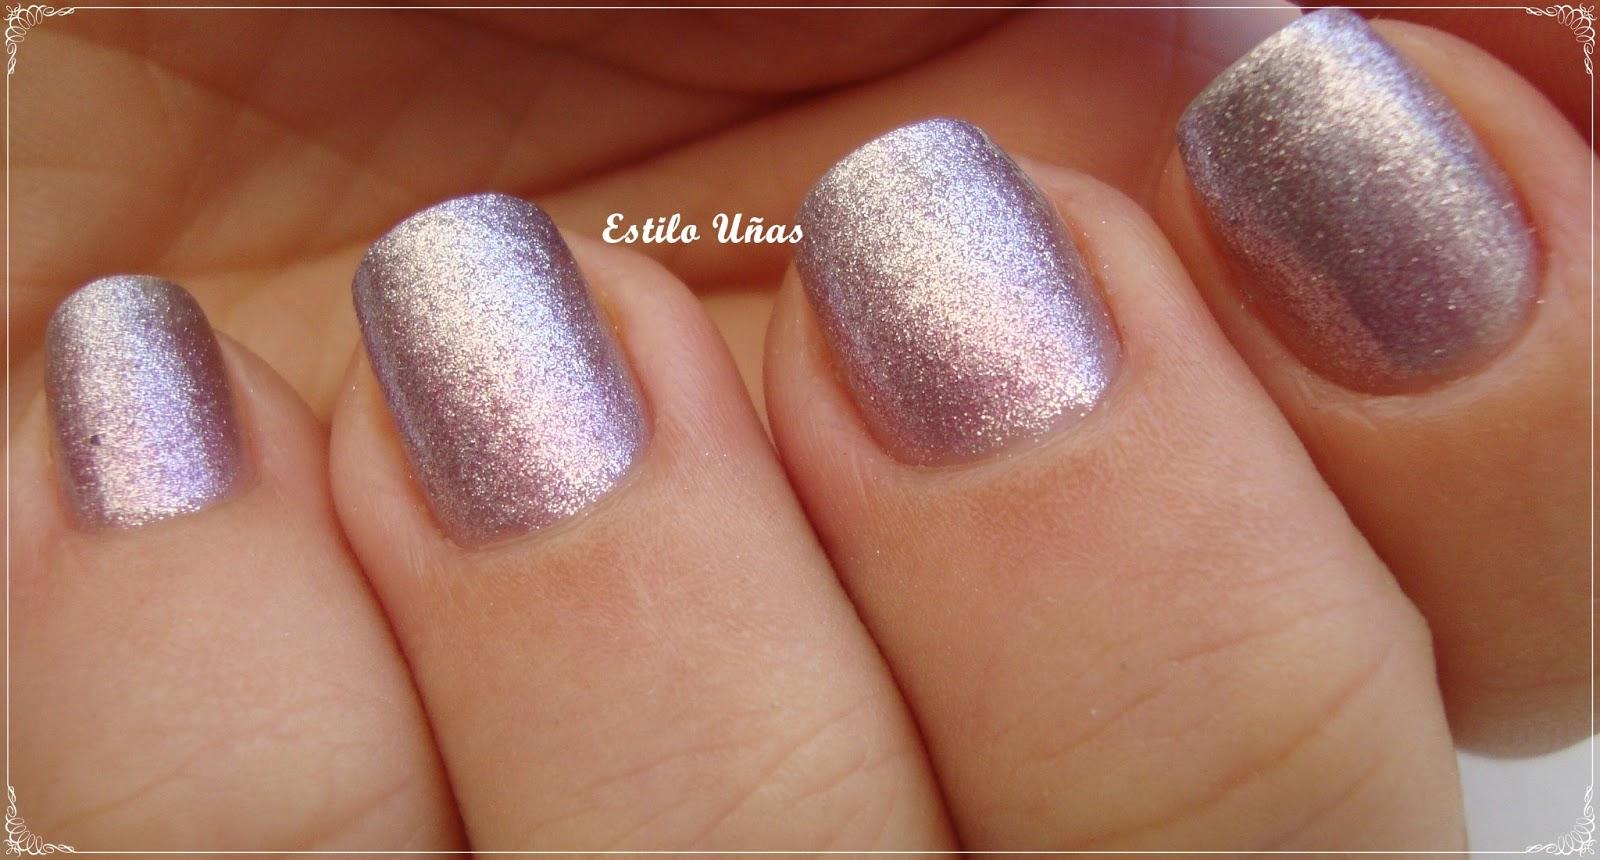 Estilo Uñas: Nail Art: Degradé metálico